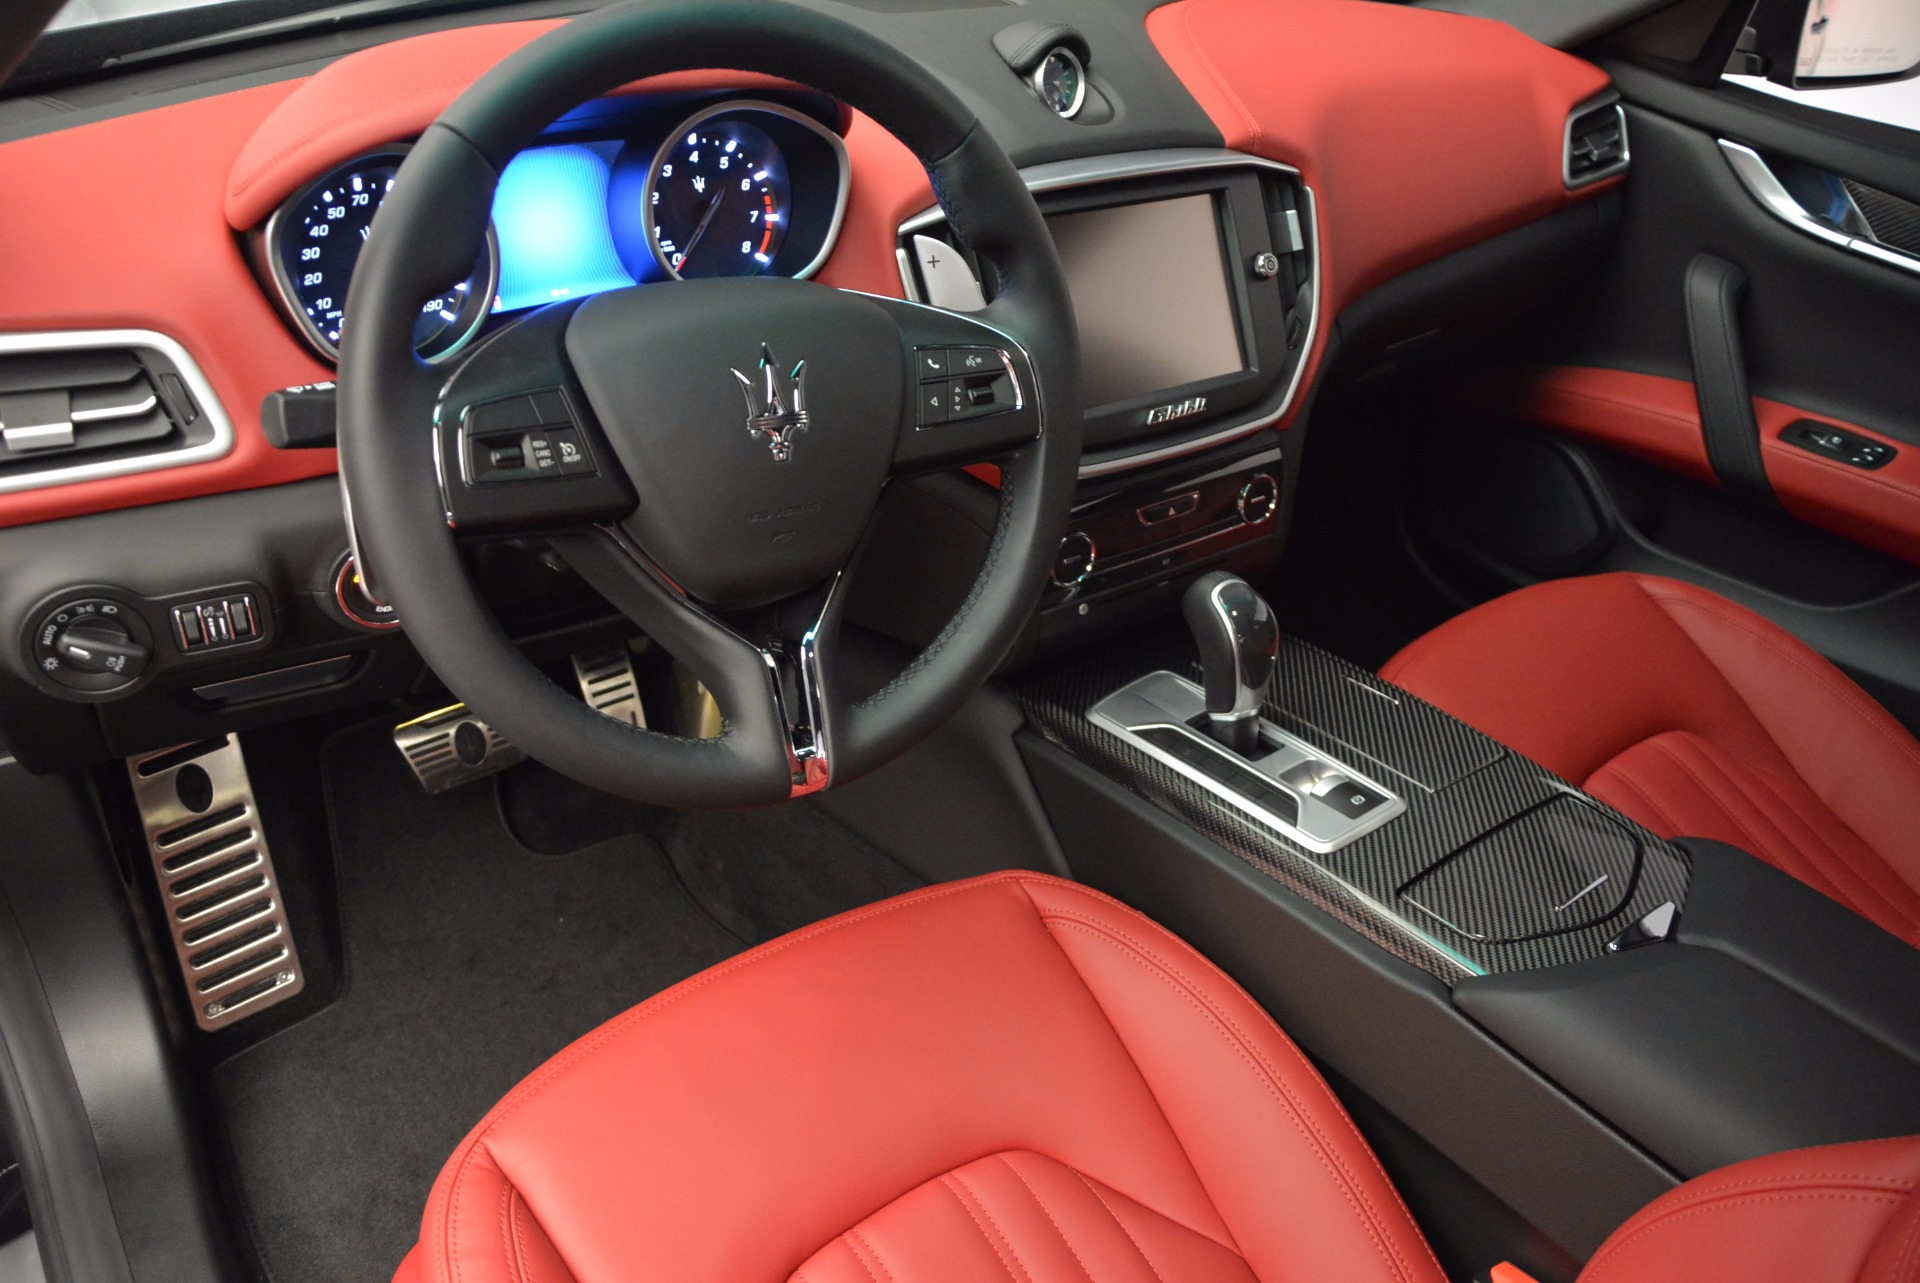 Used 2014 Maserati Ghibli S Q4 For Sale In Westport, CT 1459_p14